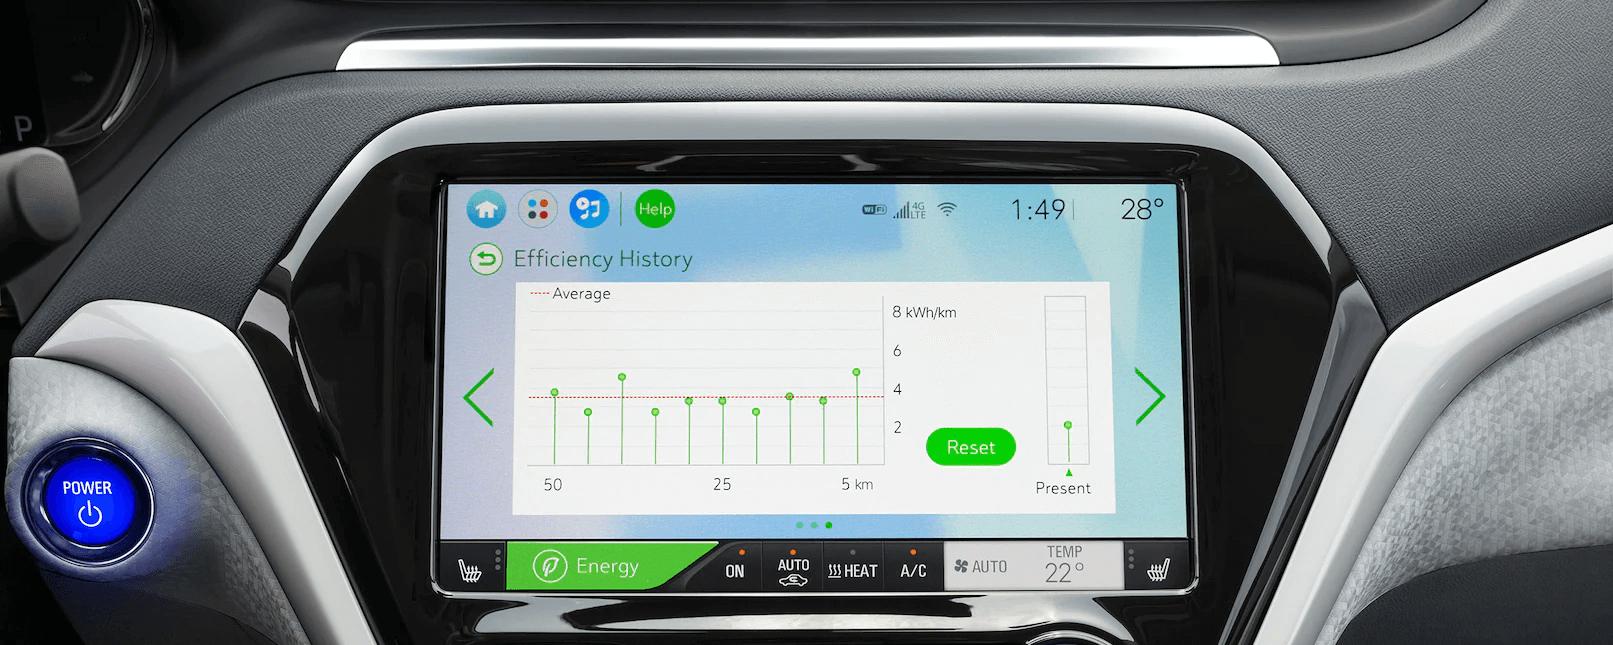 2021 Chevrolet Bolt EV Electric Car Technology: Efficiency History.